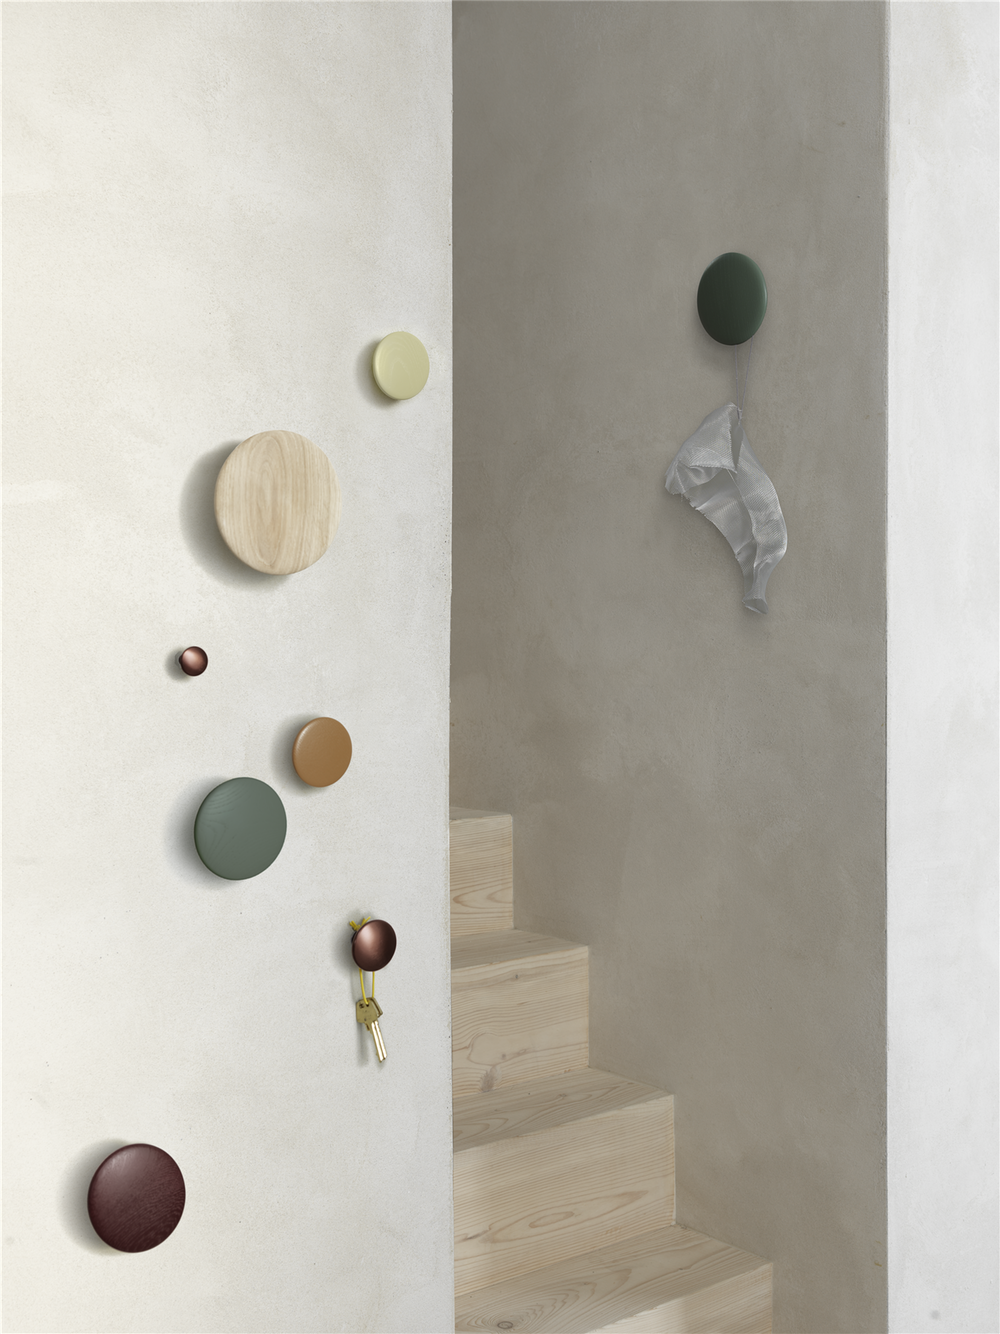 dots-oak-burgundy-clay-brown-dusty-green-beige-green-metal-umber-org-1521555755.png